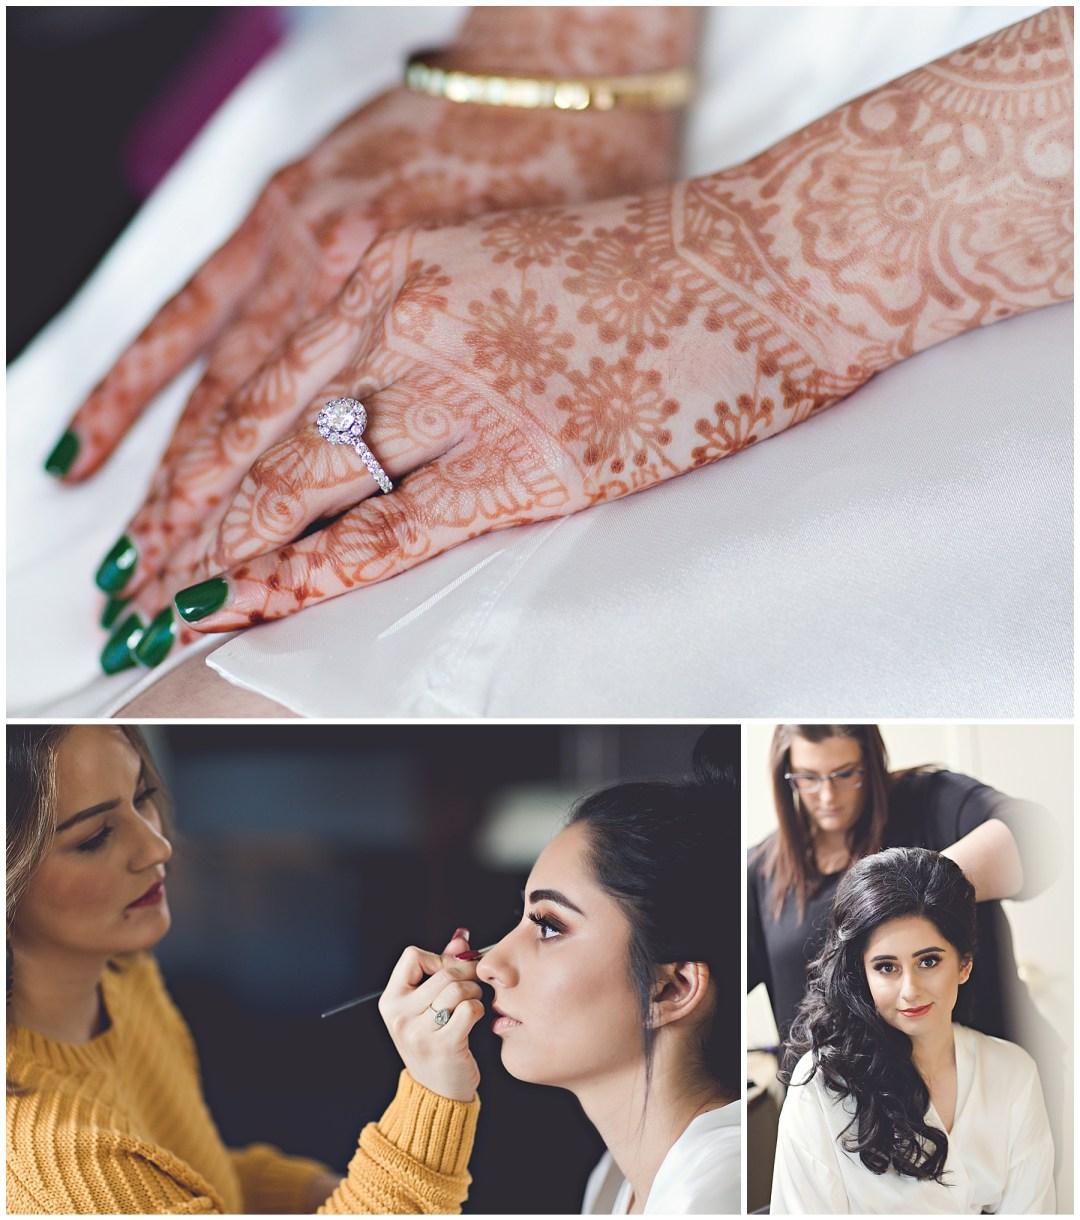 henna art on bride's hand